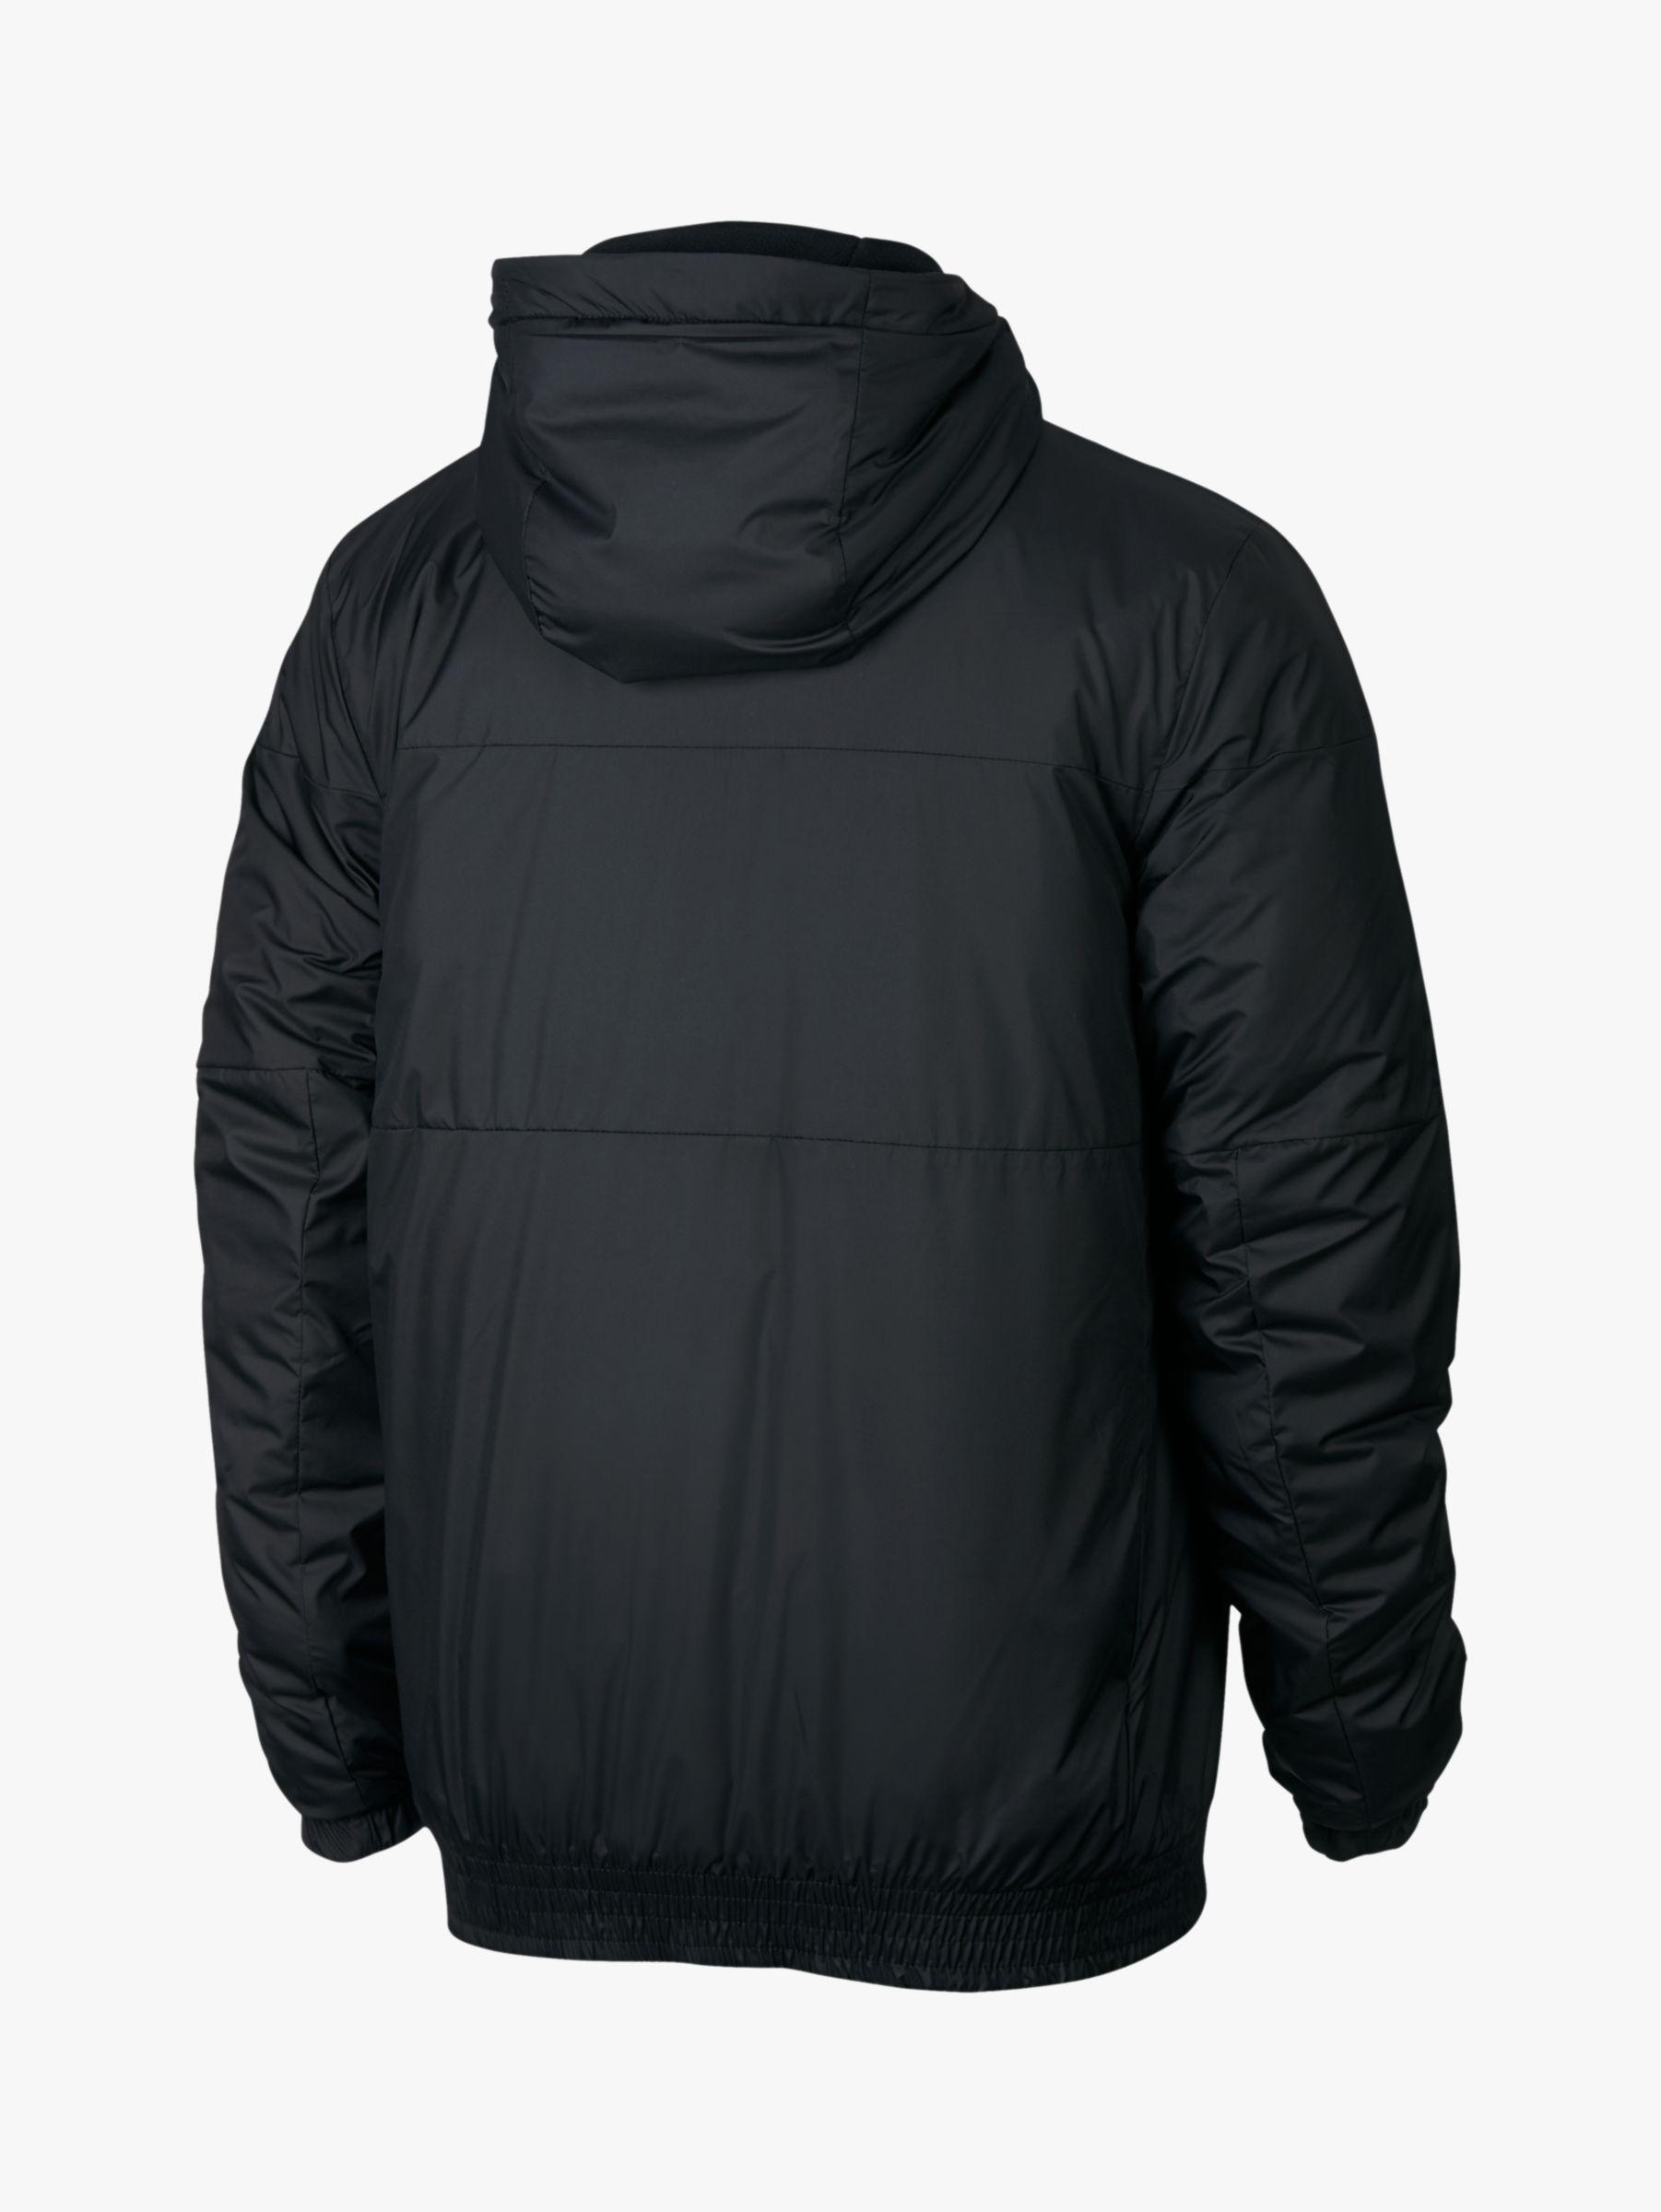 Nike - Black Synthetic Fill Jacket for Men - Lyst. View fullscreen ca7581b2e